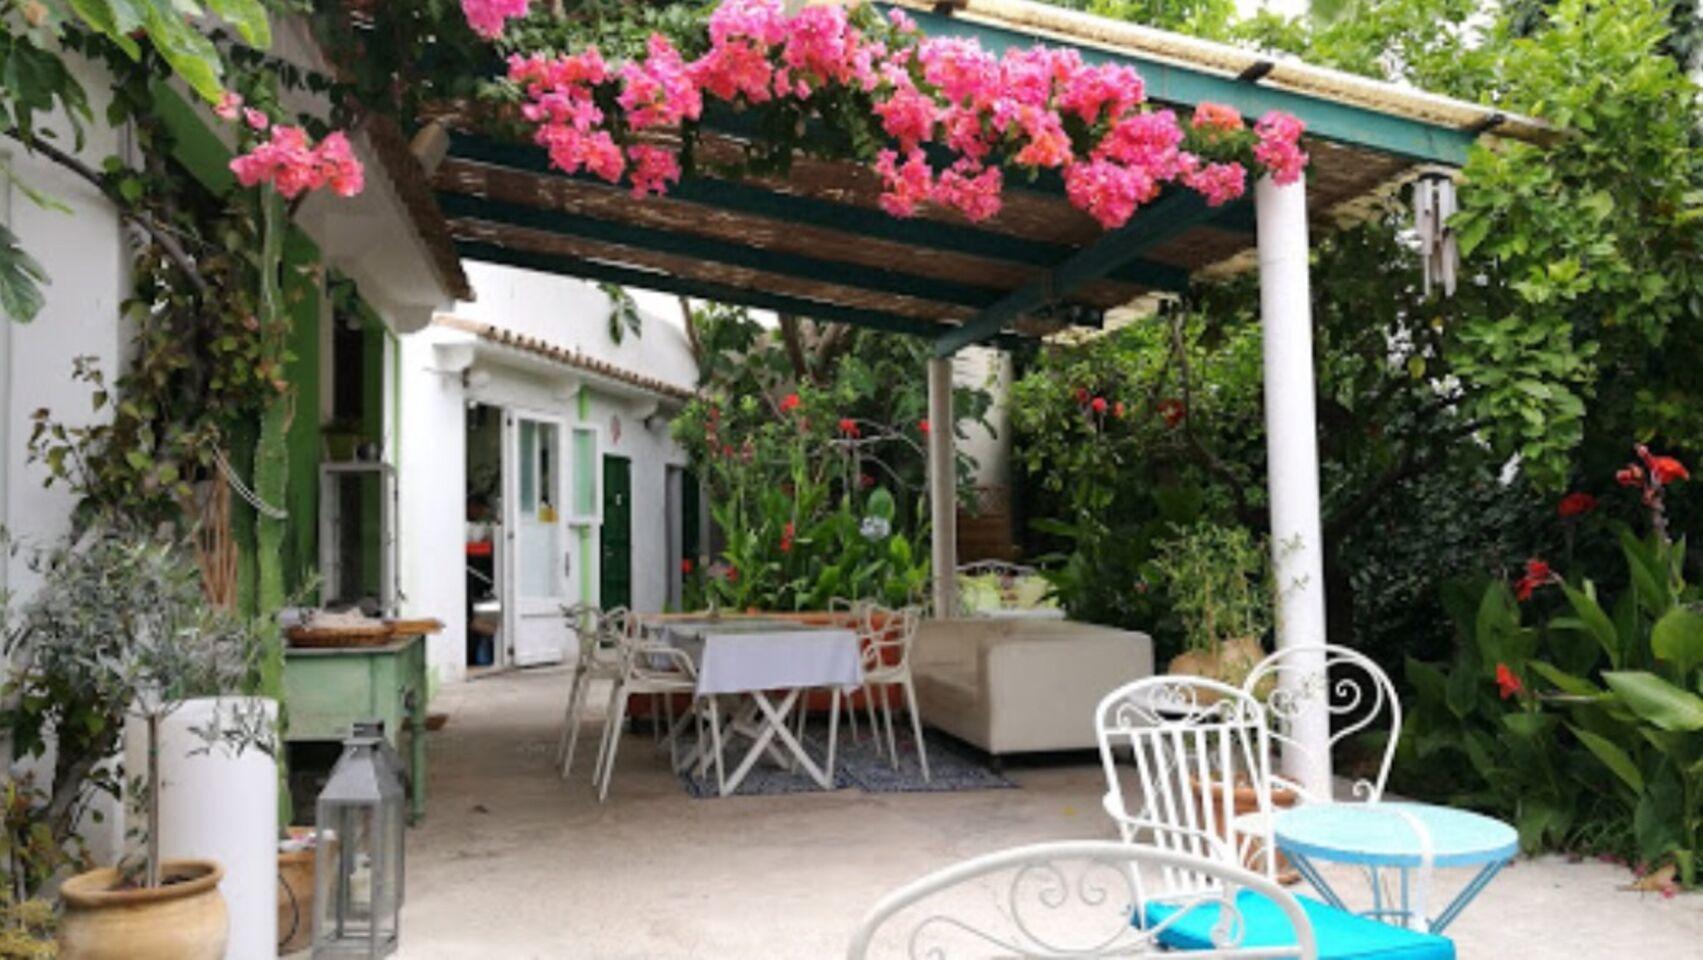 A photo of Restaurante Bellaverde